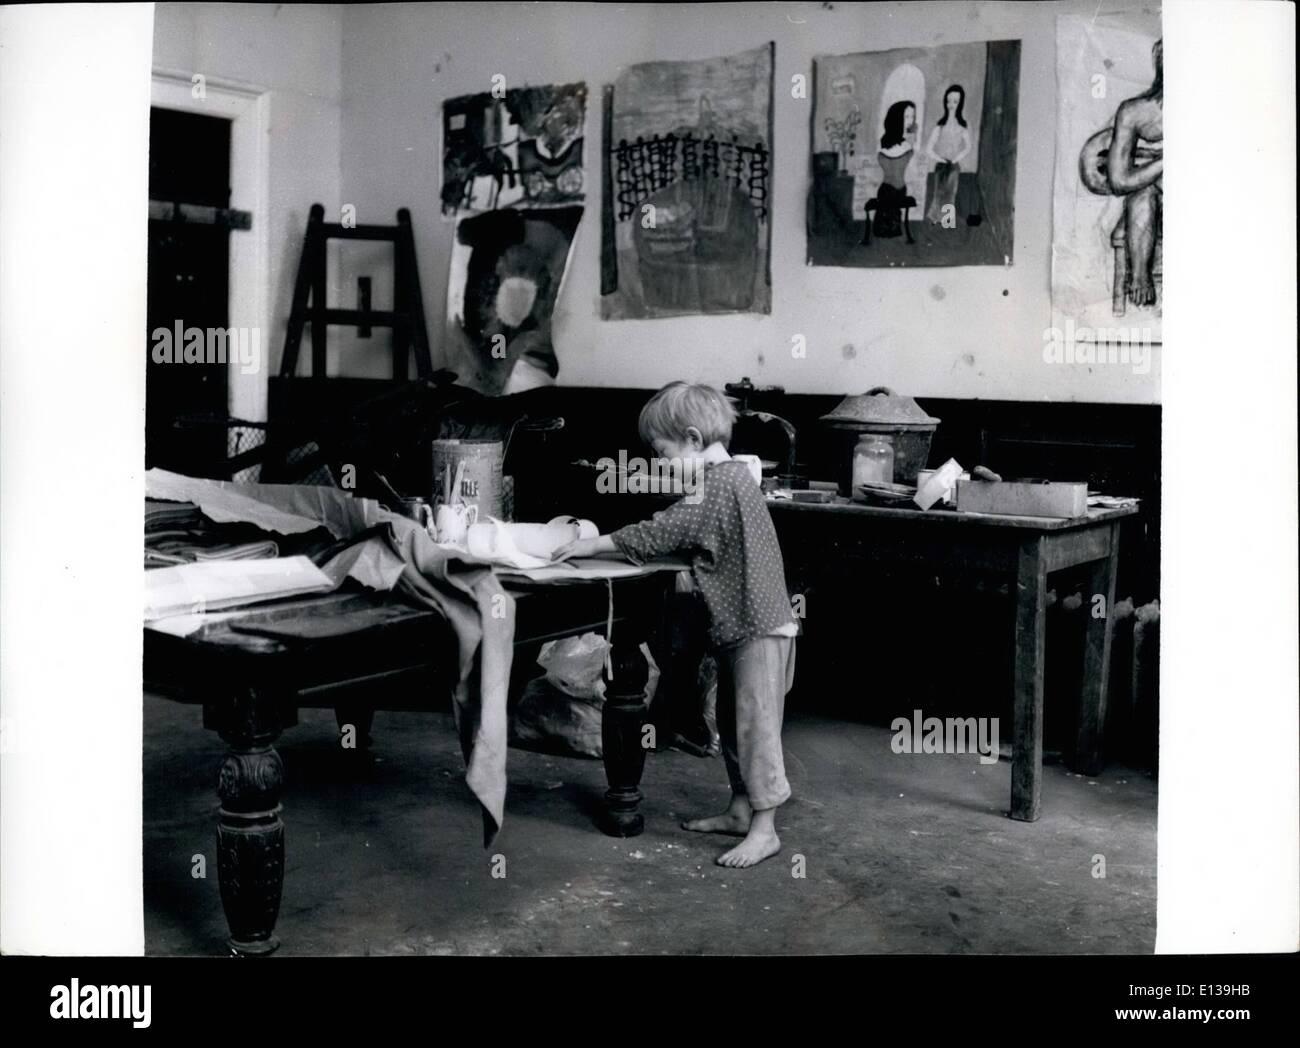 Feb. 29, 2012 - No Oliver Twist - 6-year-old pupil Vaughan Leslie. - Stock Image